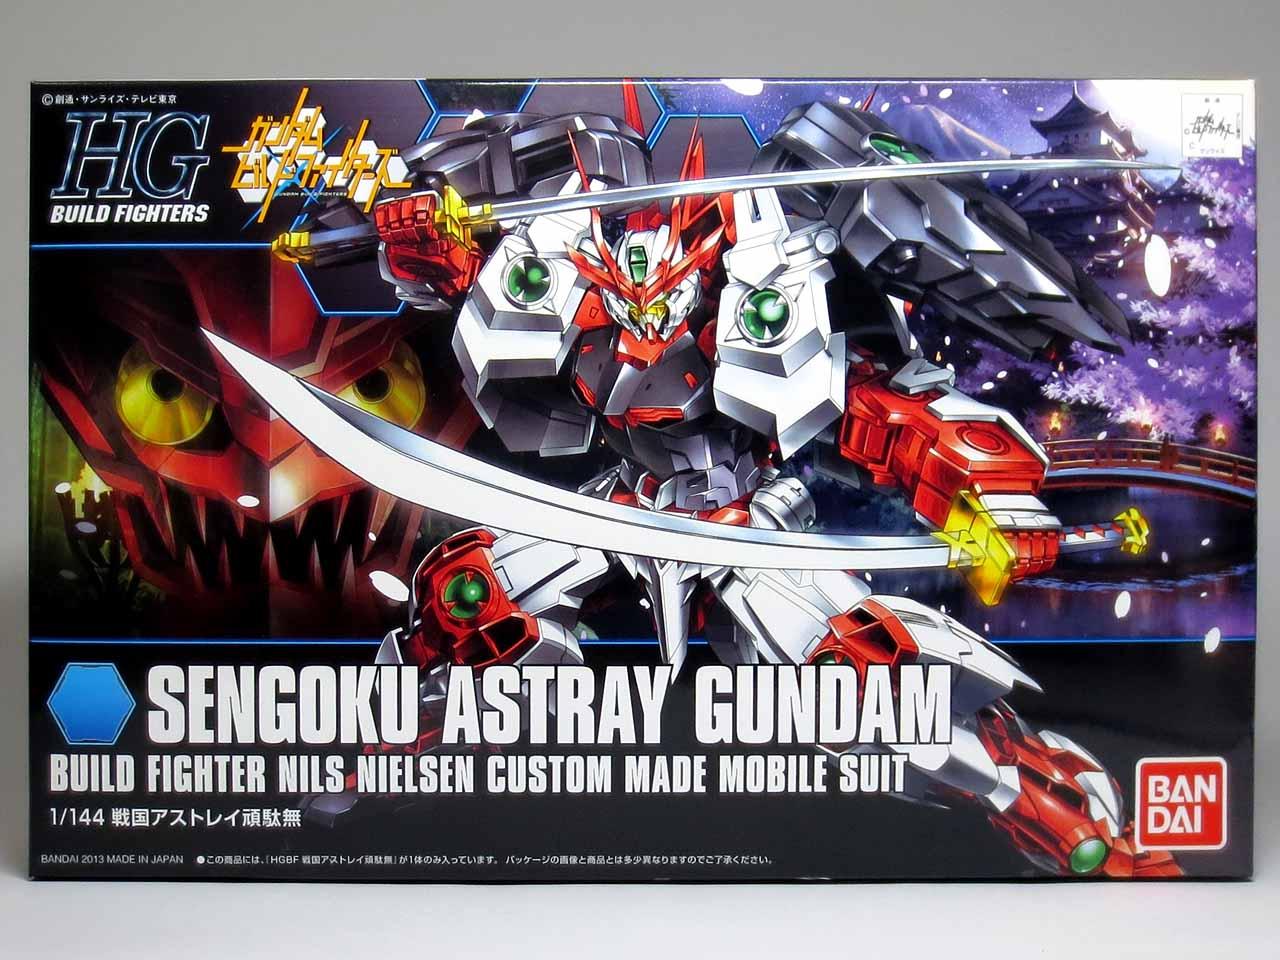 HGBF_Sengoku_Astray_Gundam_02.jpg